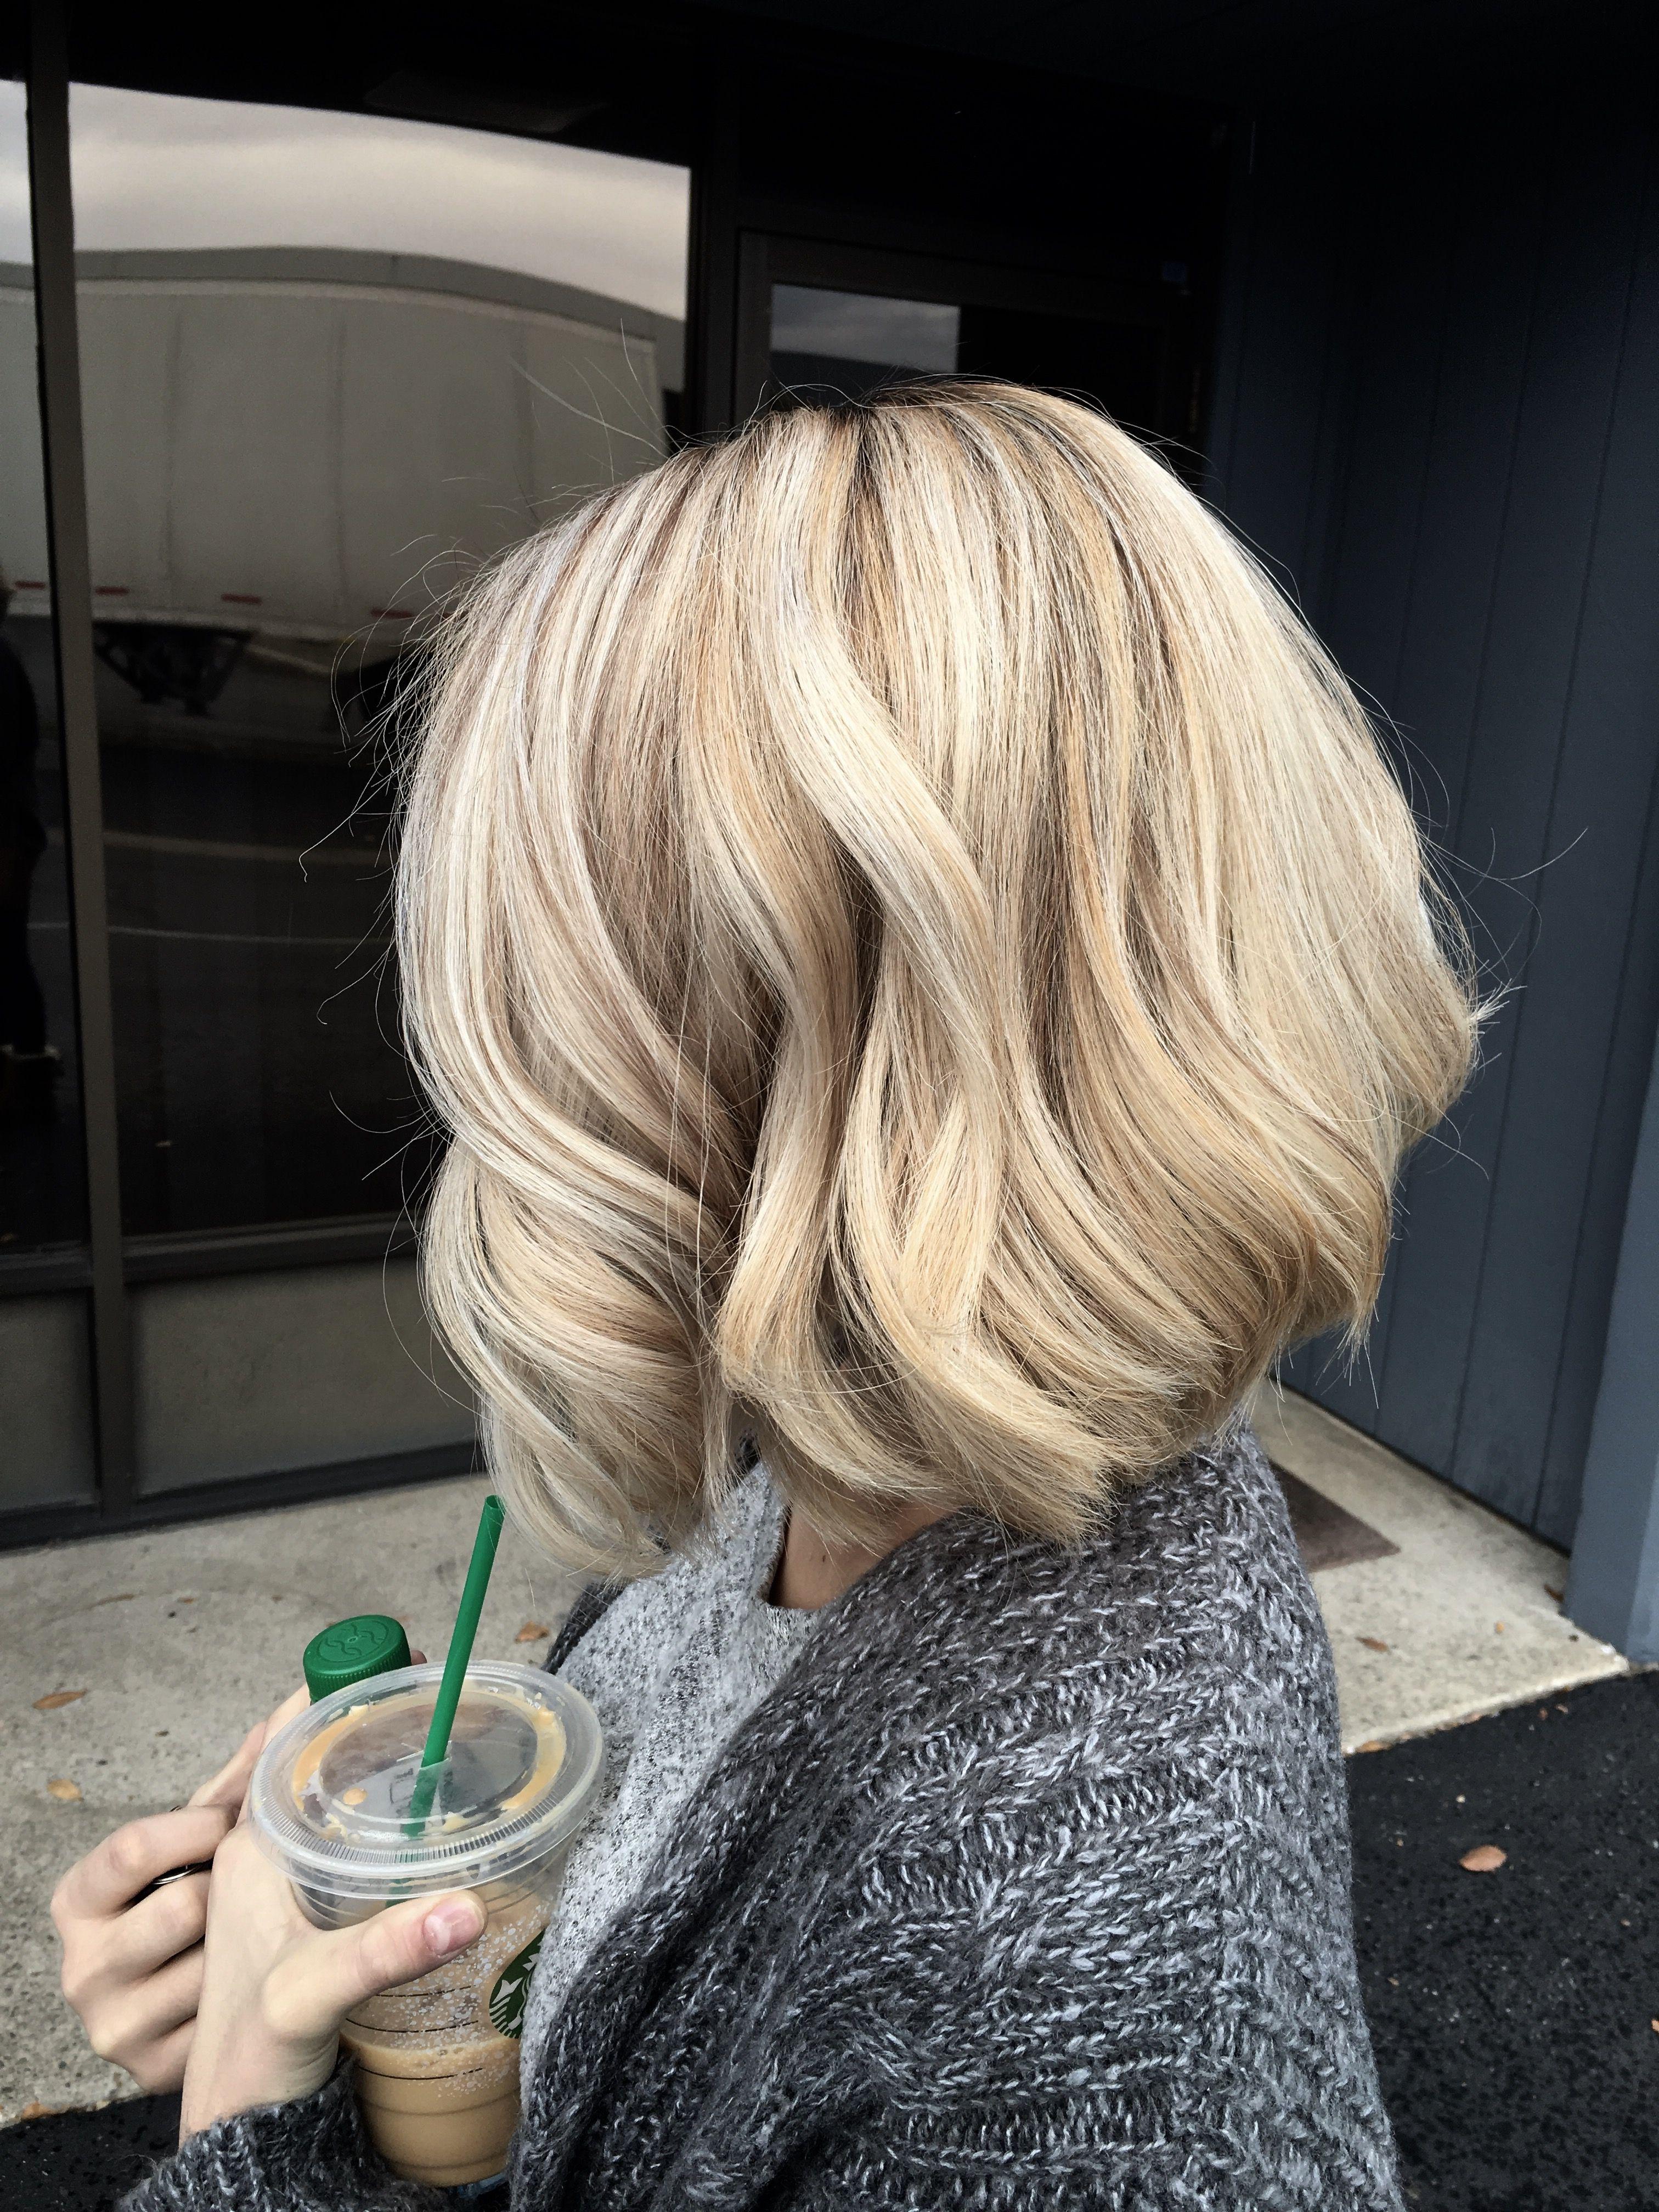 This was done on my hair last week by the wonderful catalina radu